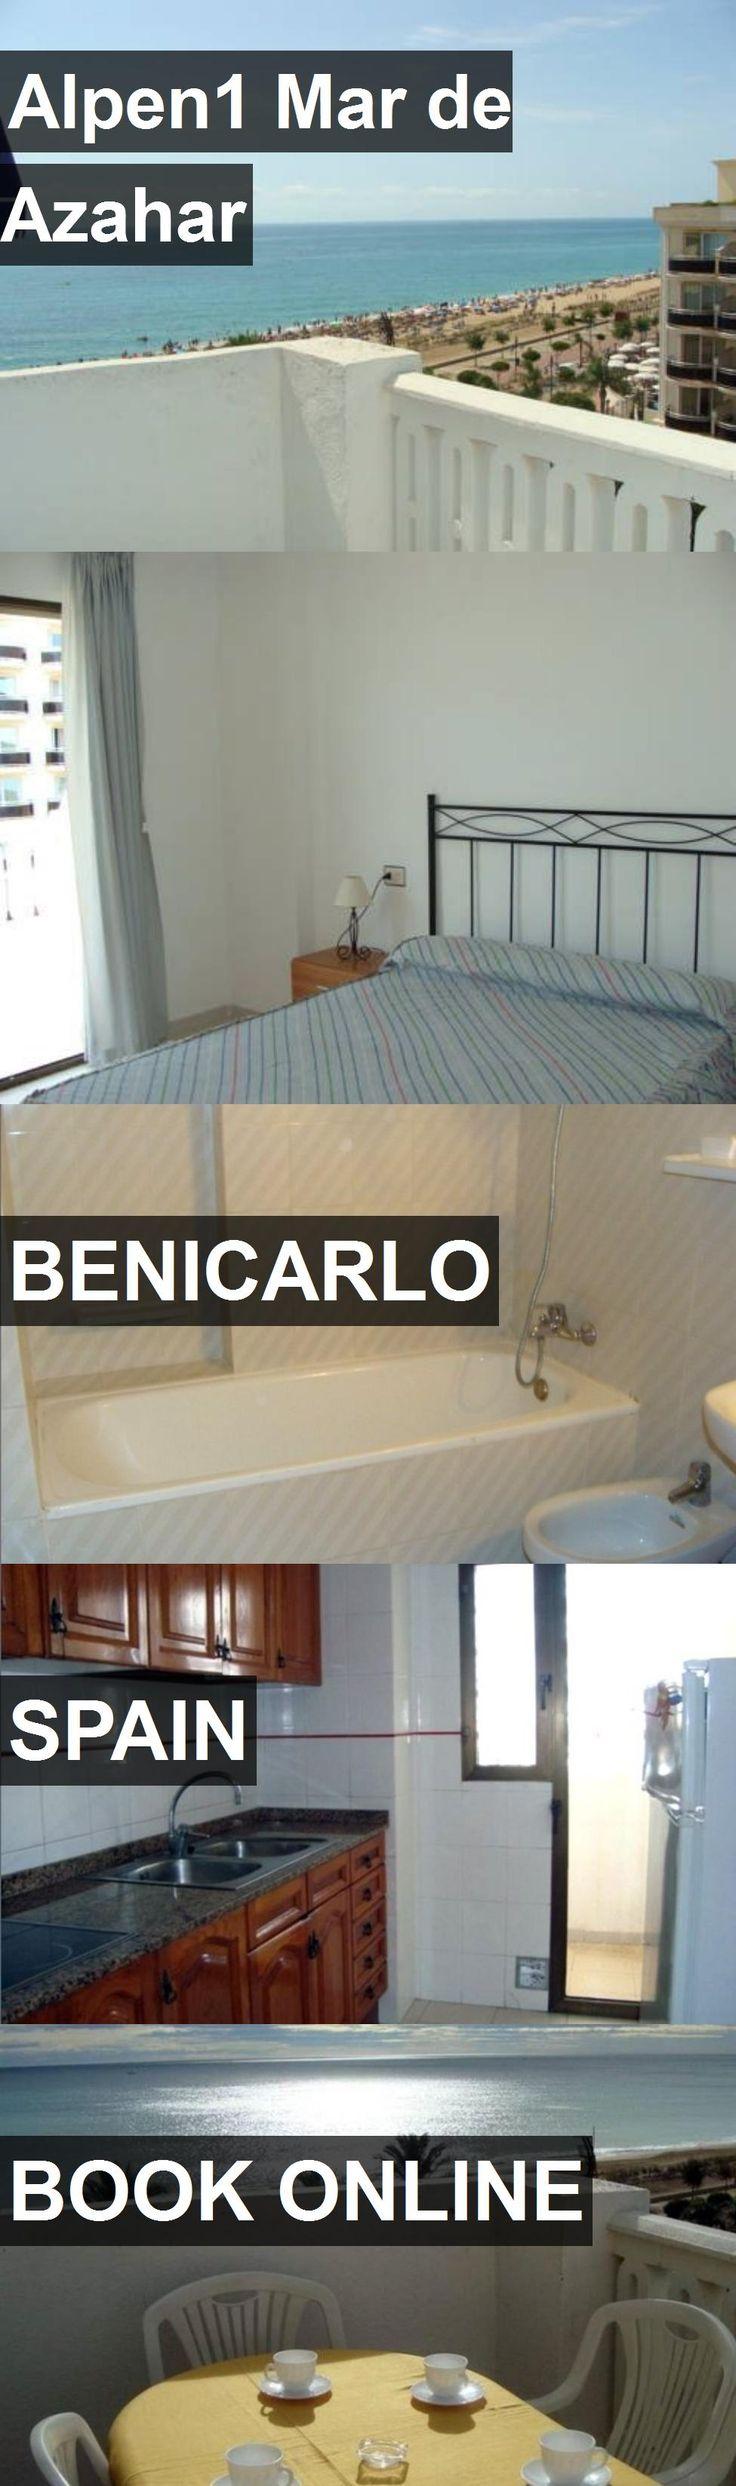 Hotel Alpen1 Mar de Azahar in Benicarlo, Spain. For more information, photos, reviews and best prices please follow the link. #Spain #Benicarlo #Alpen1MardeAzahar #hotel #travel #vacation